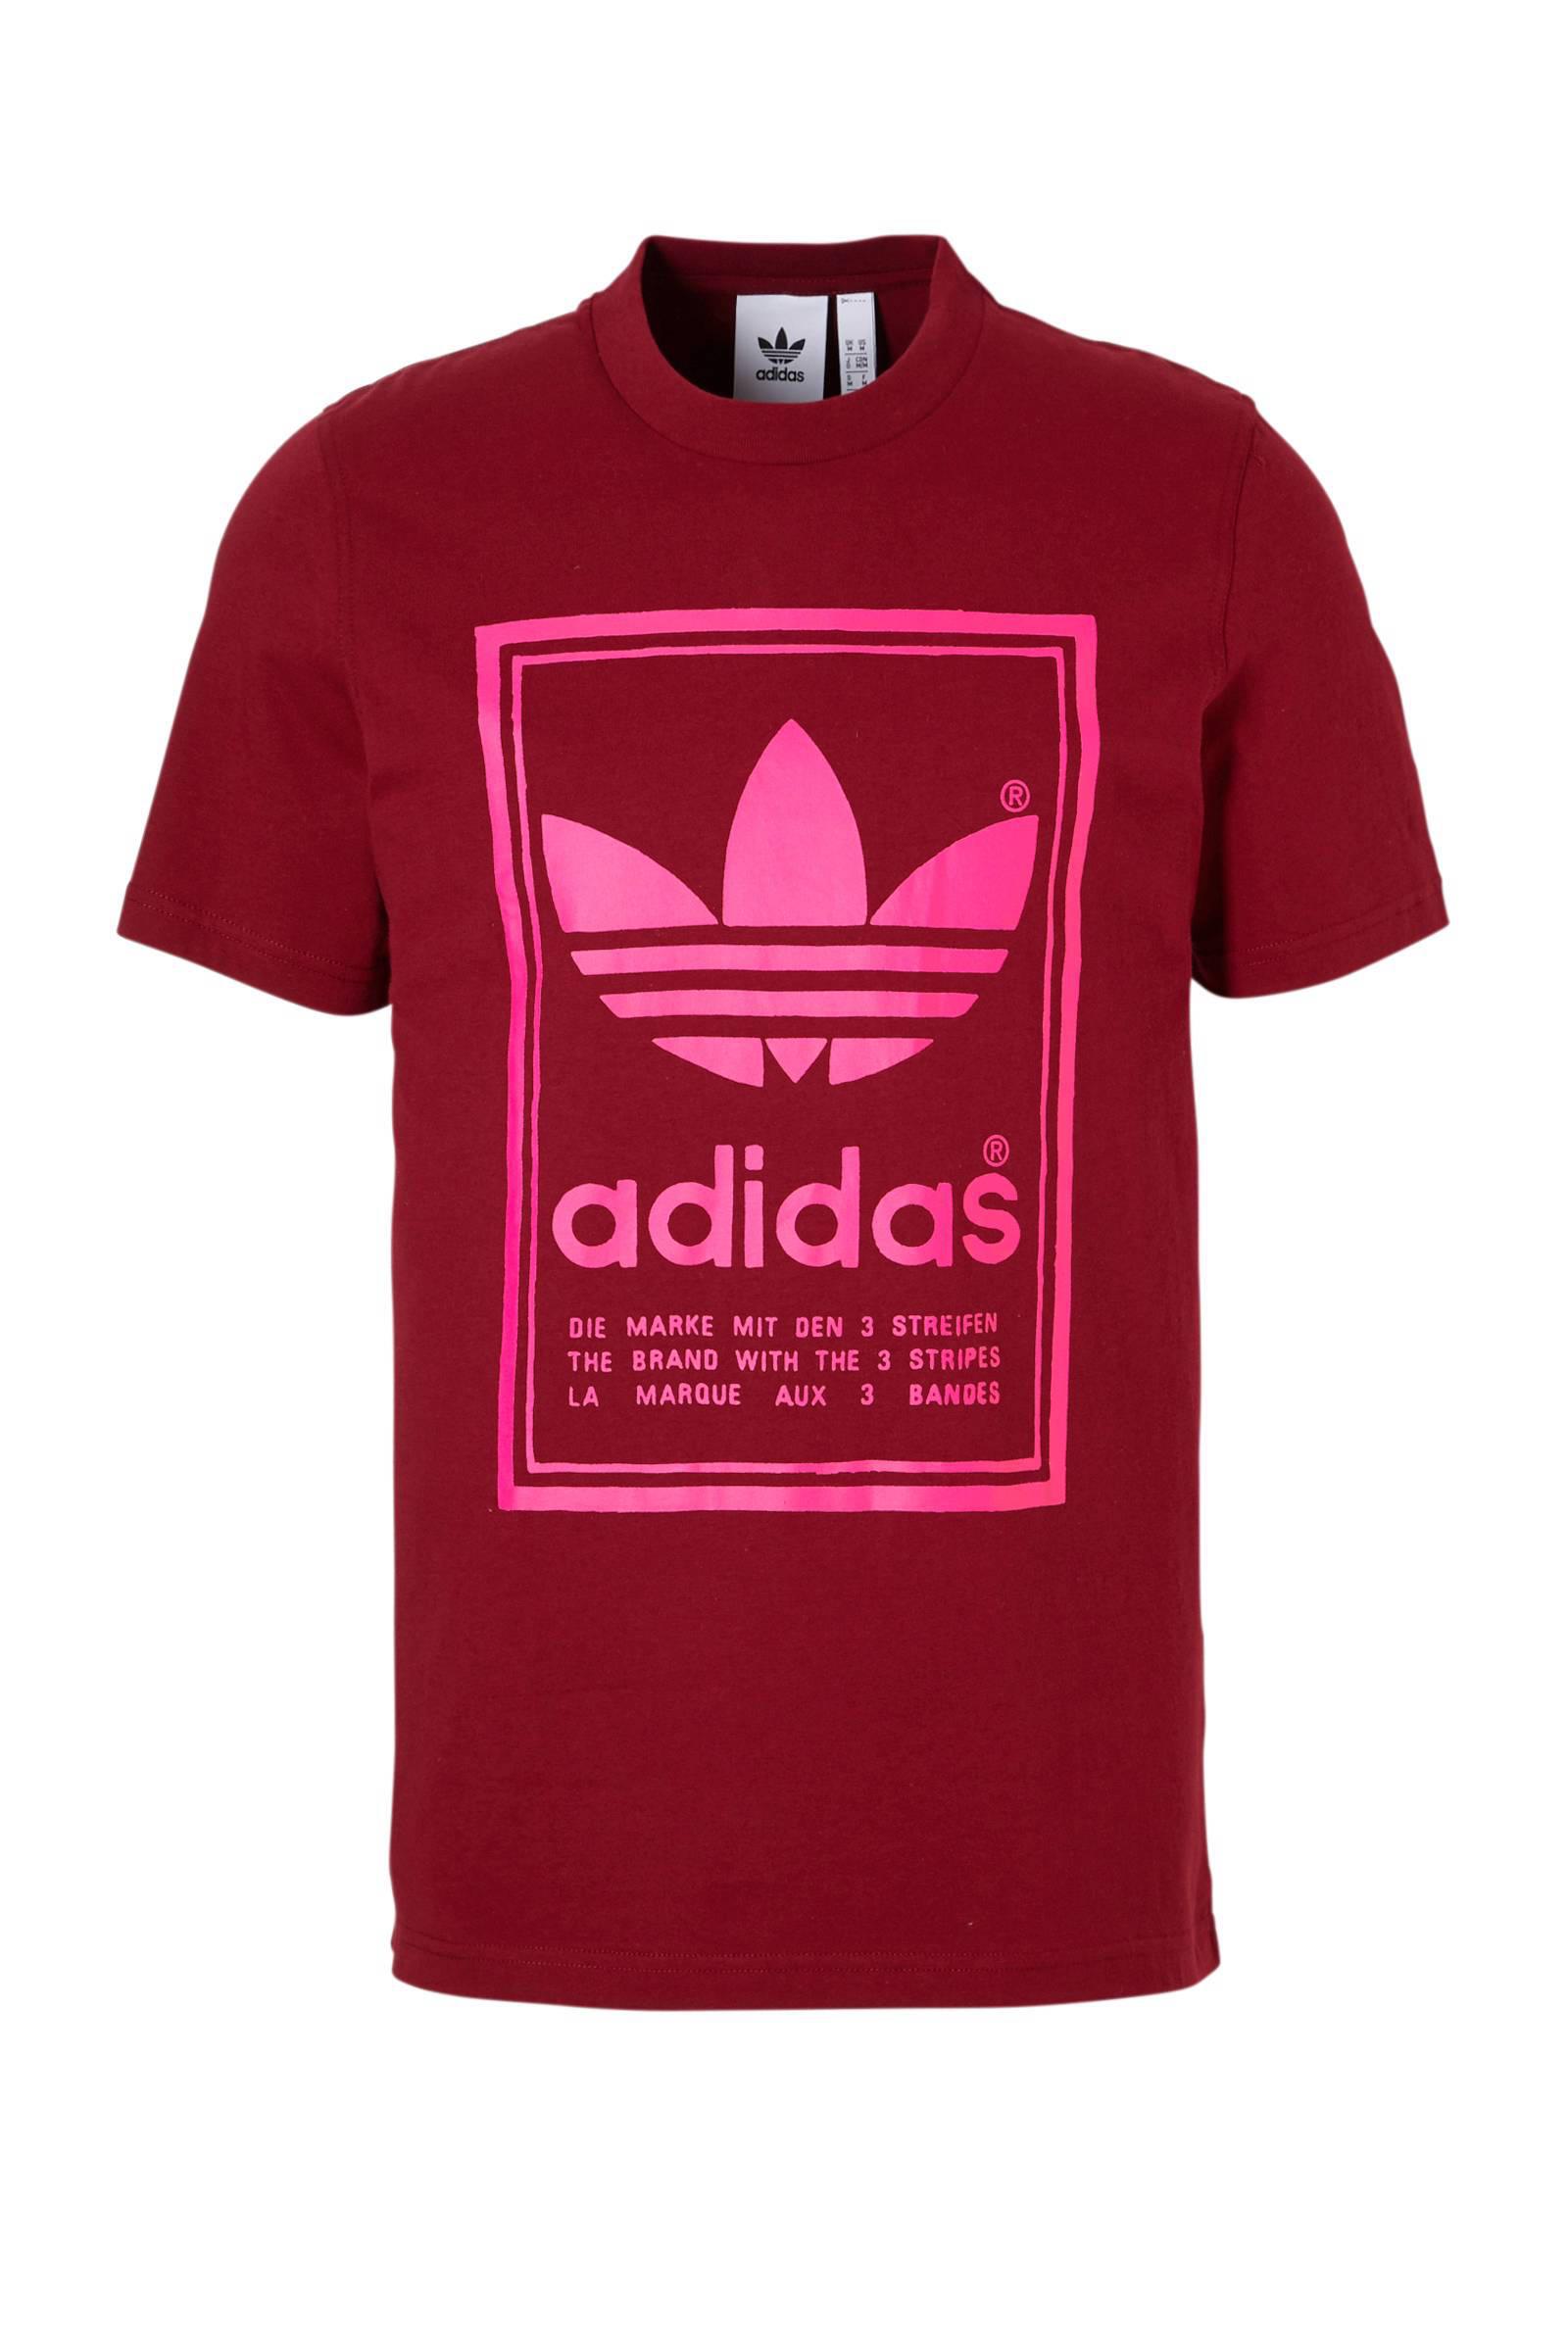 Adidas Wehkamp T Shirt T Originals Wehkamp Adidas Shirt Originals qxwRFOpw